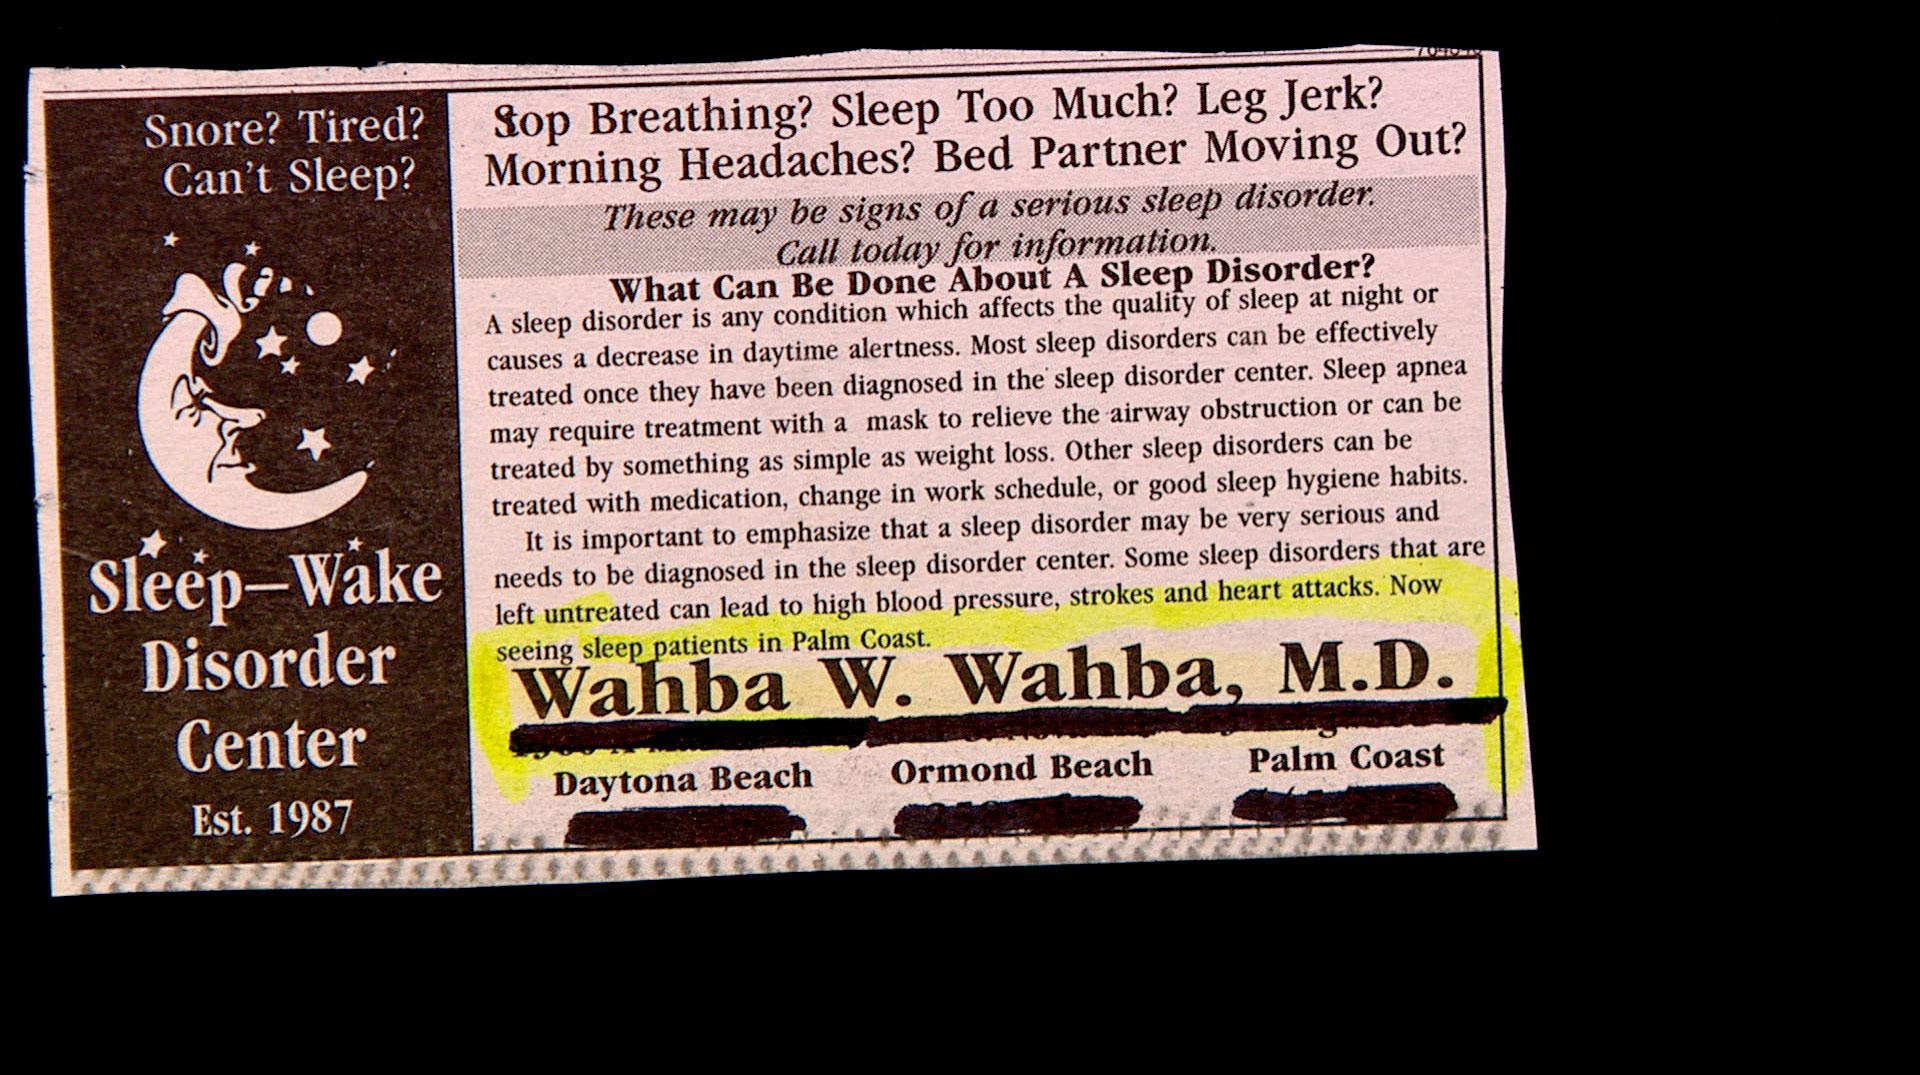 Dr. Wahba W. Wahba